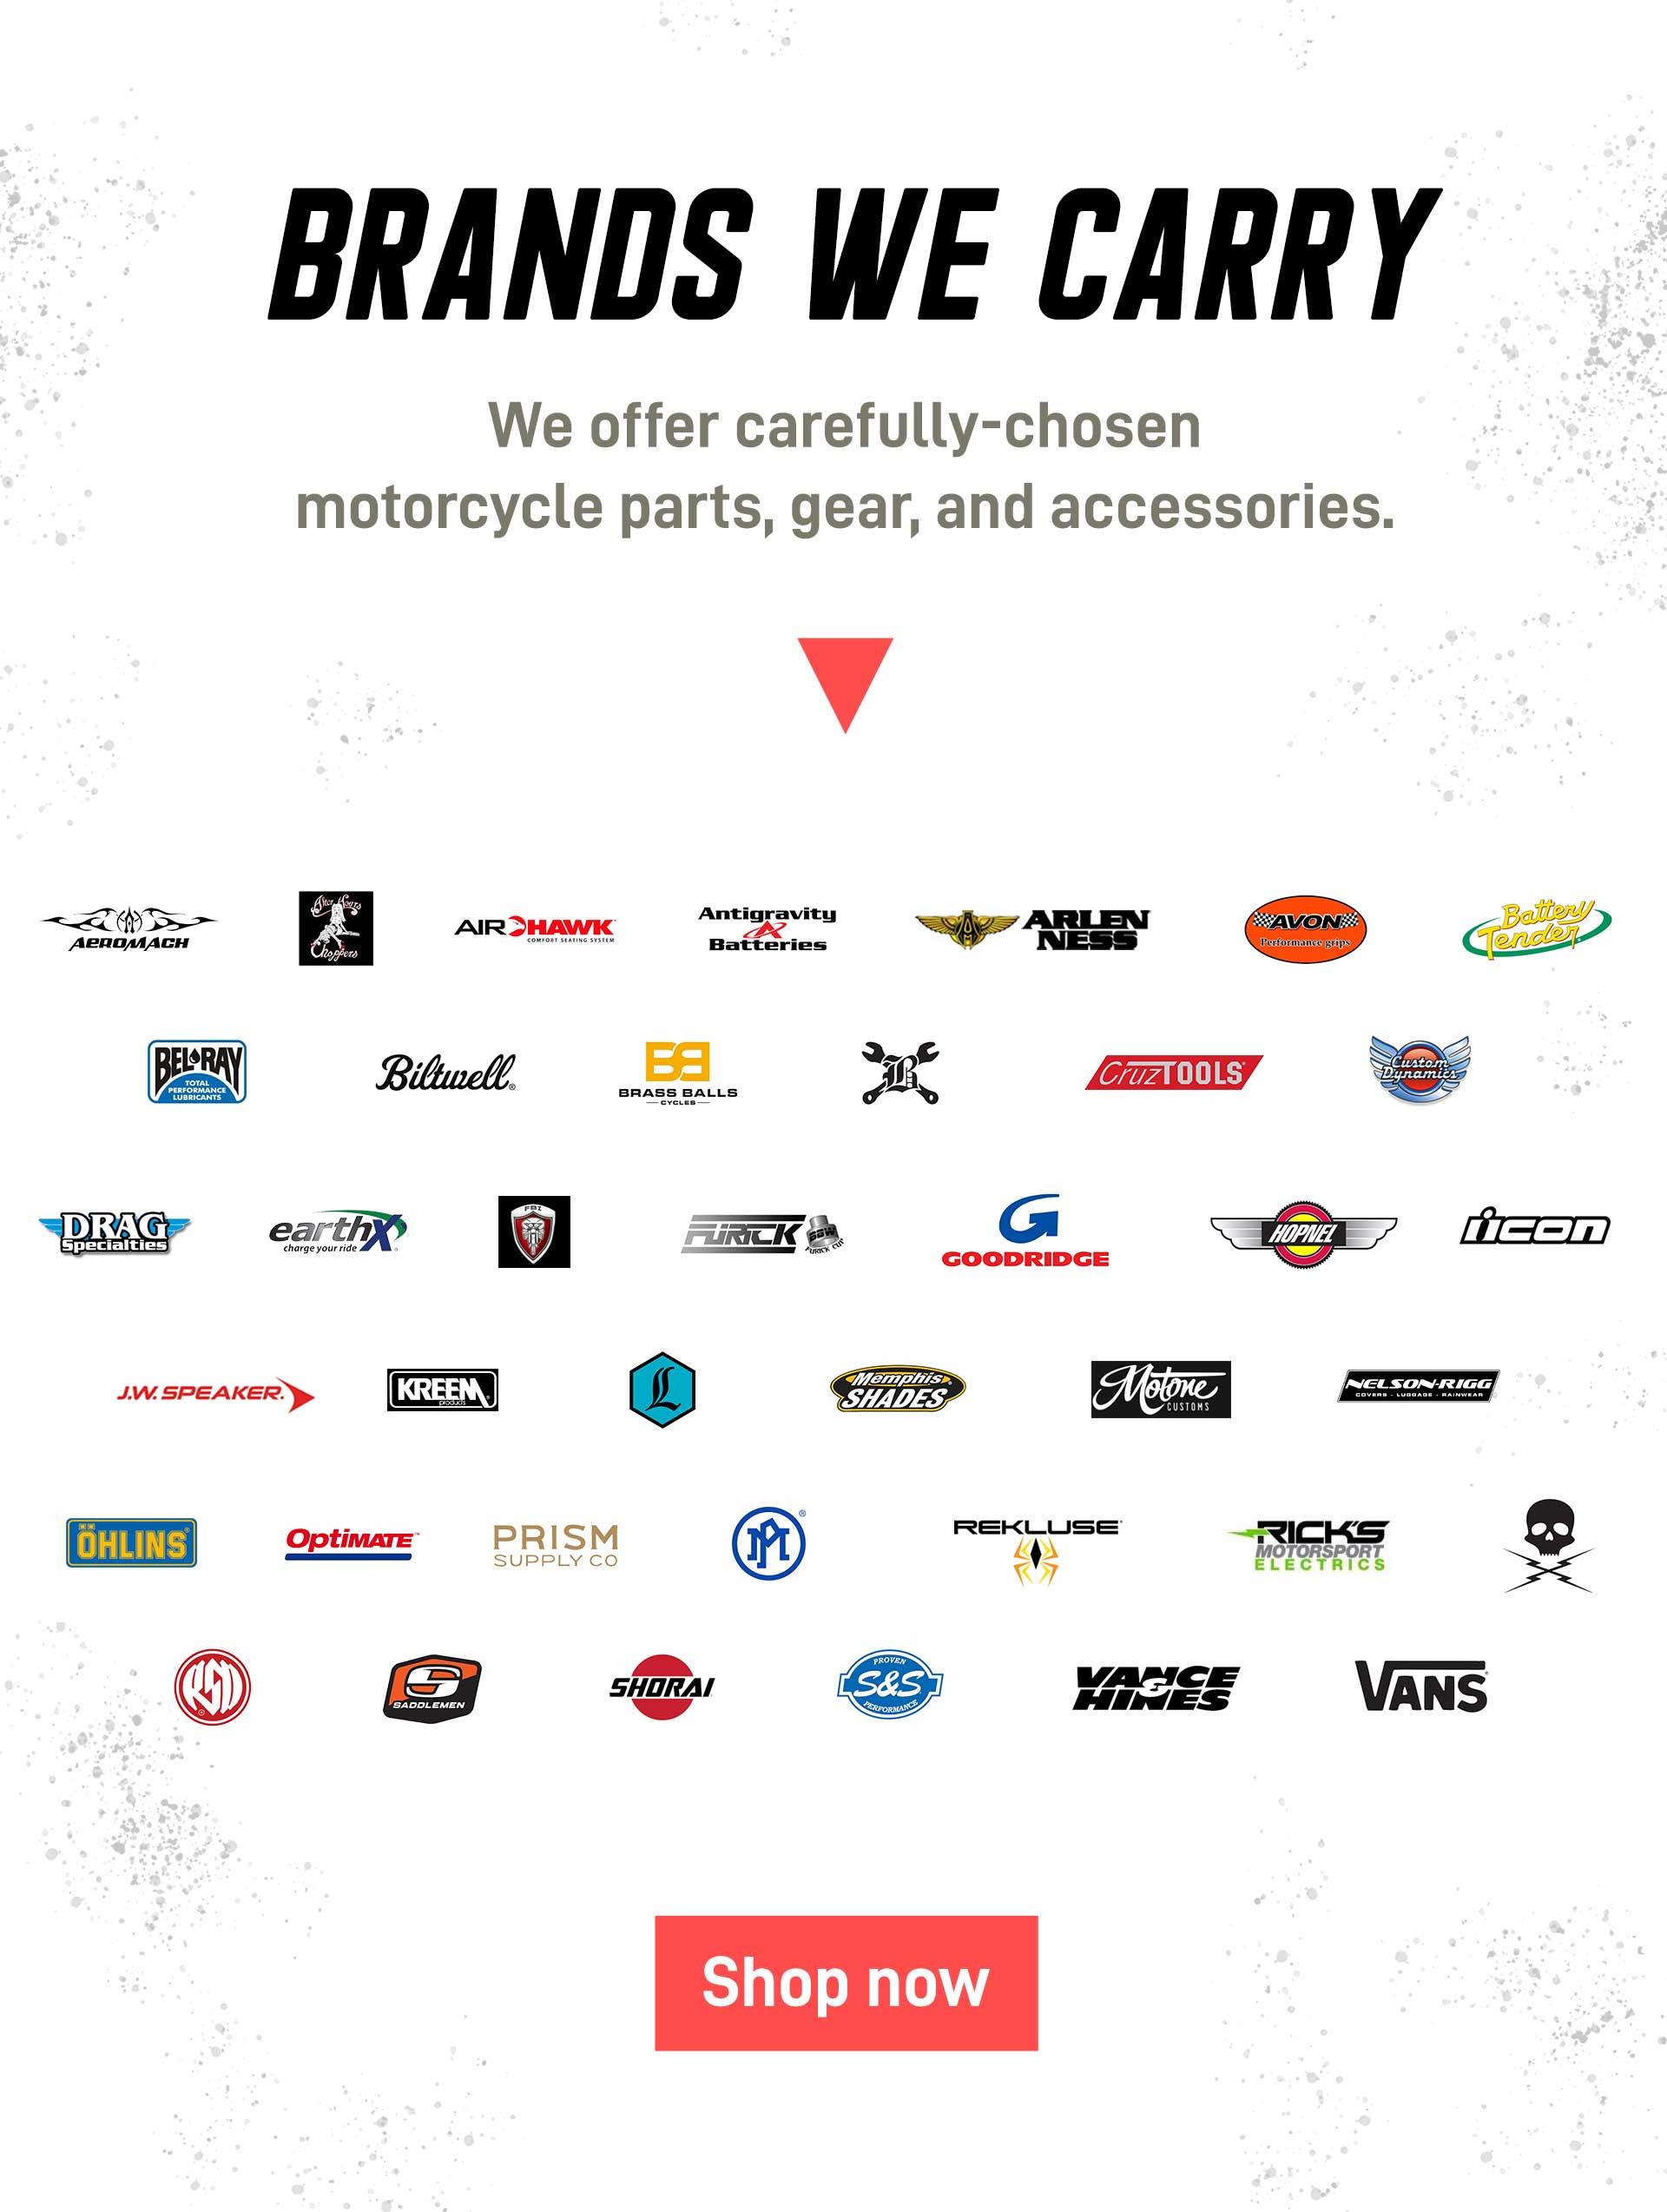 billet-proof-website-ad-brands-we-carry-1.jpg